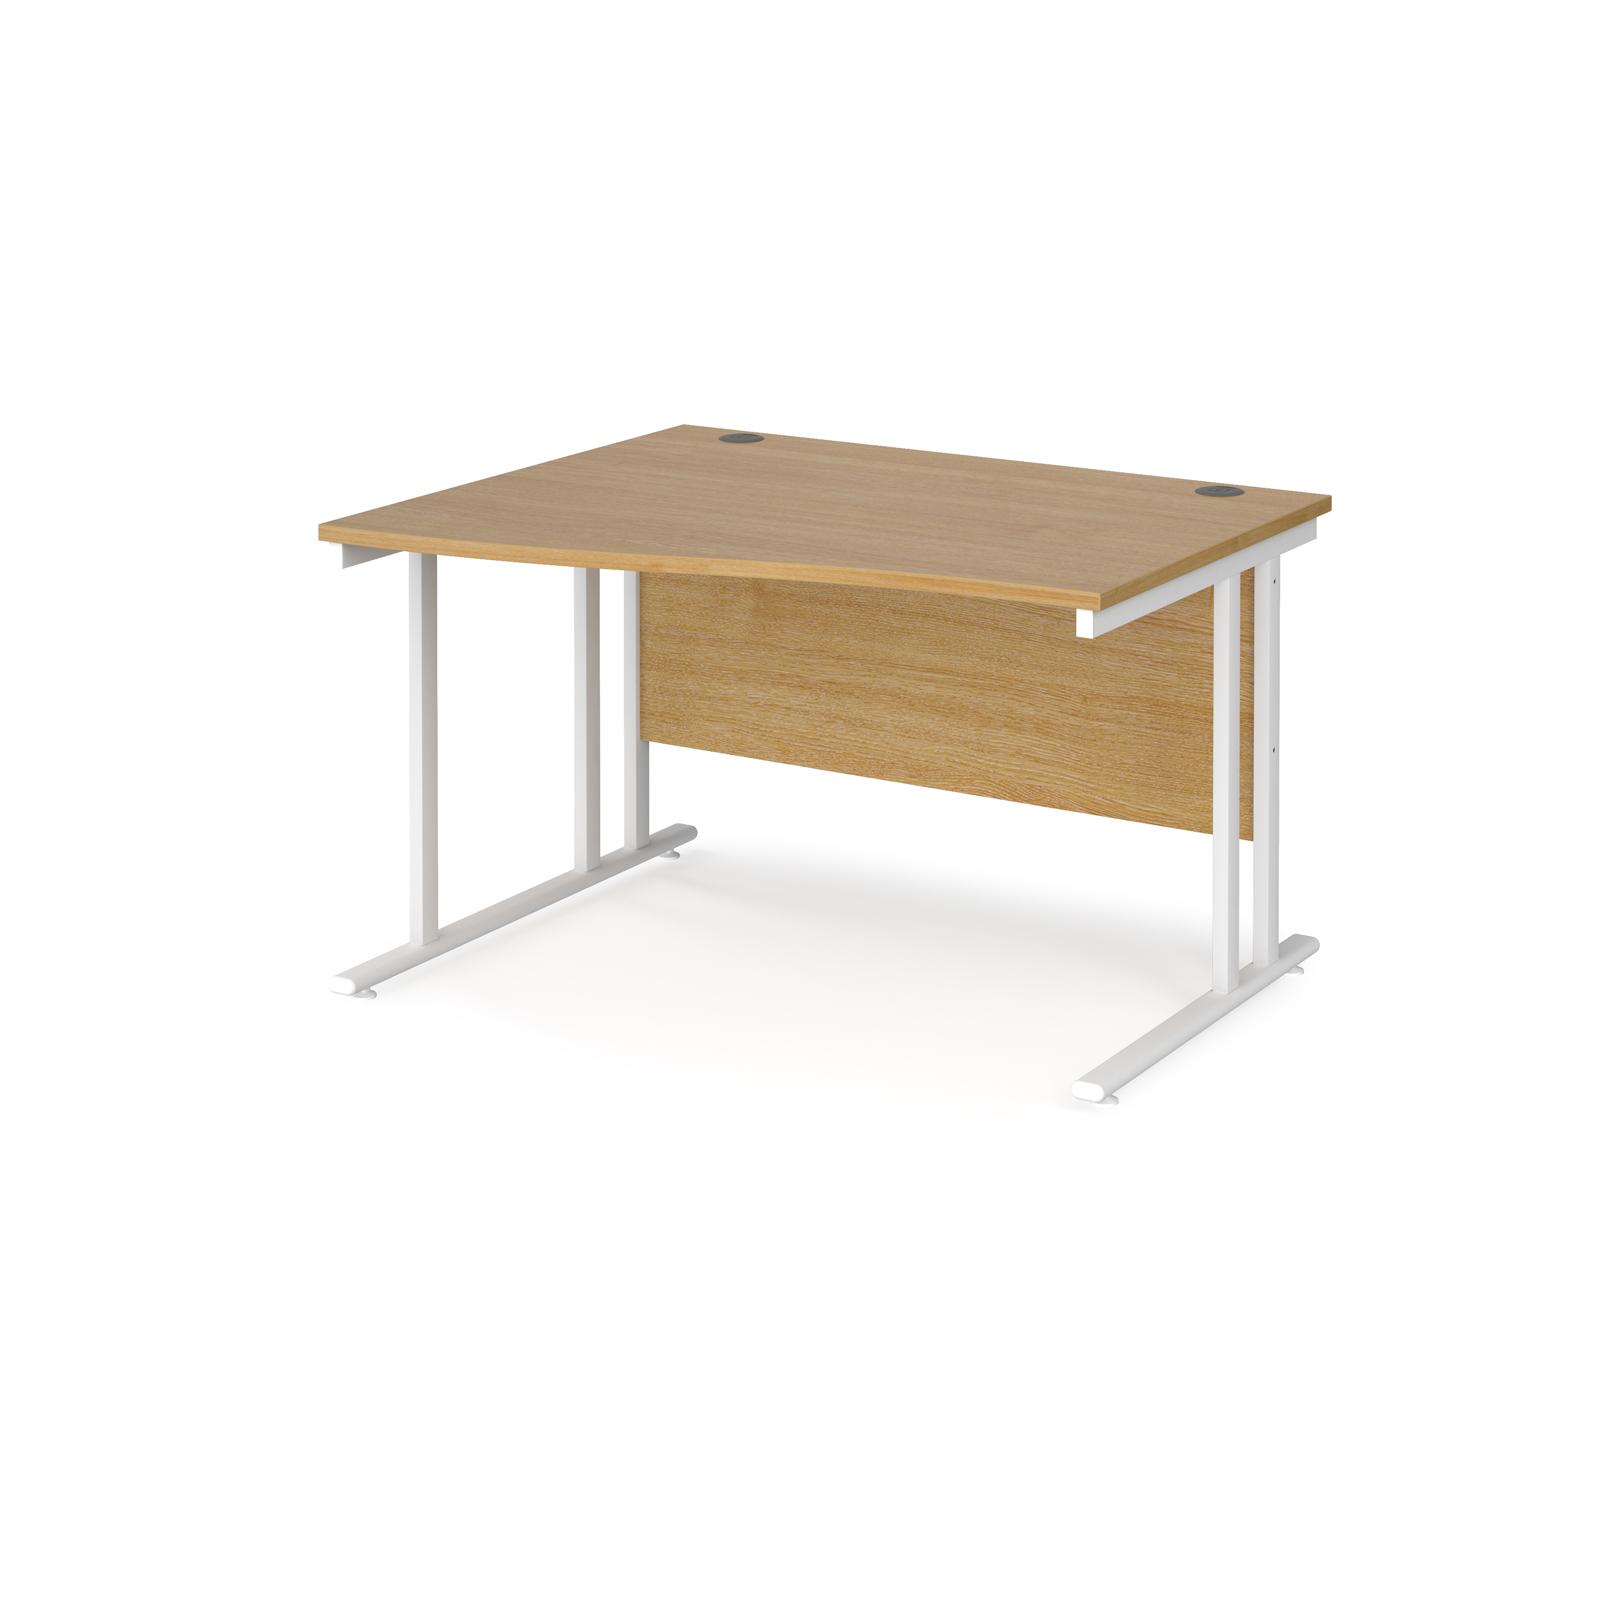 Left Handed Maestro 25 left hand wave desk 1200mm wide - white cantilever leg frame, oak top